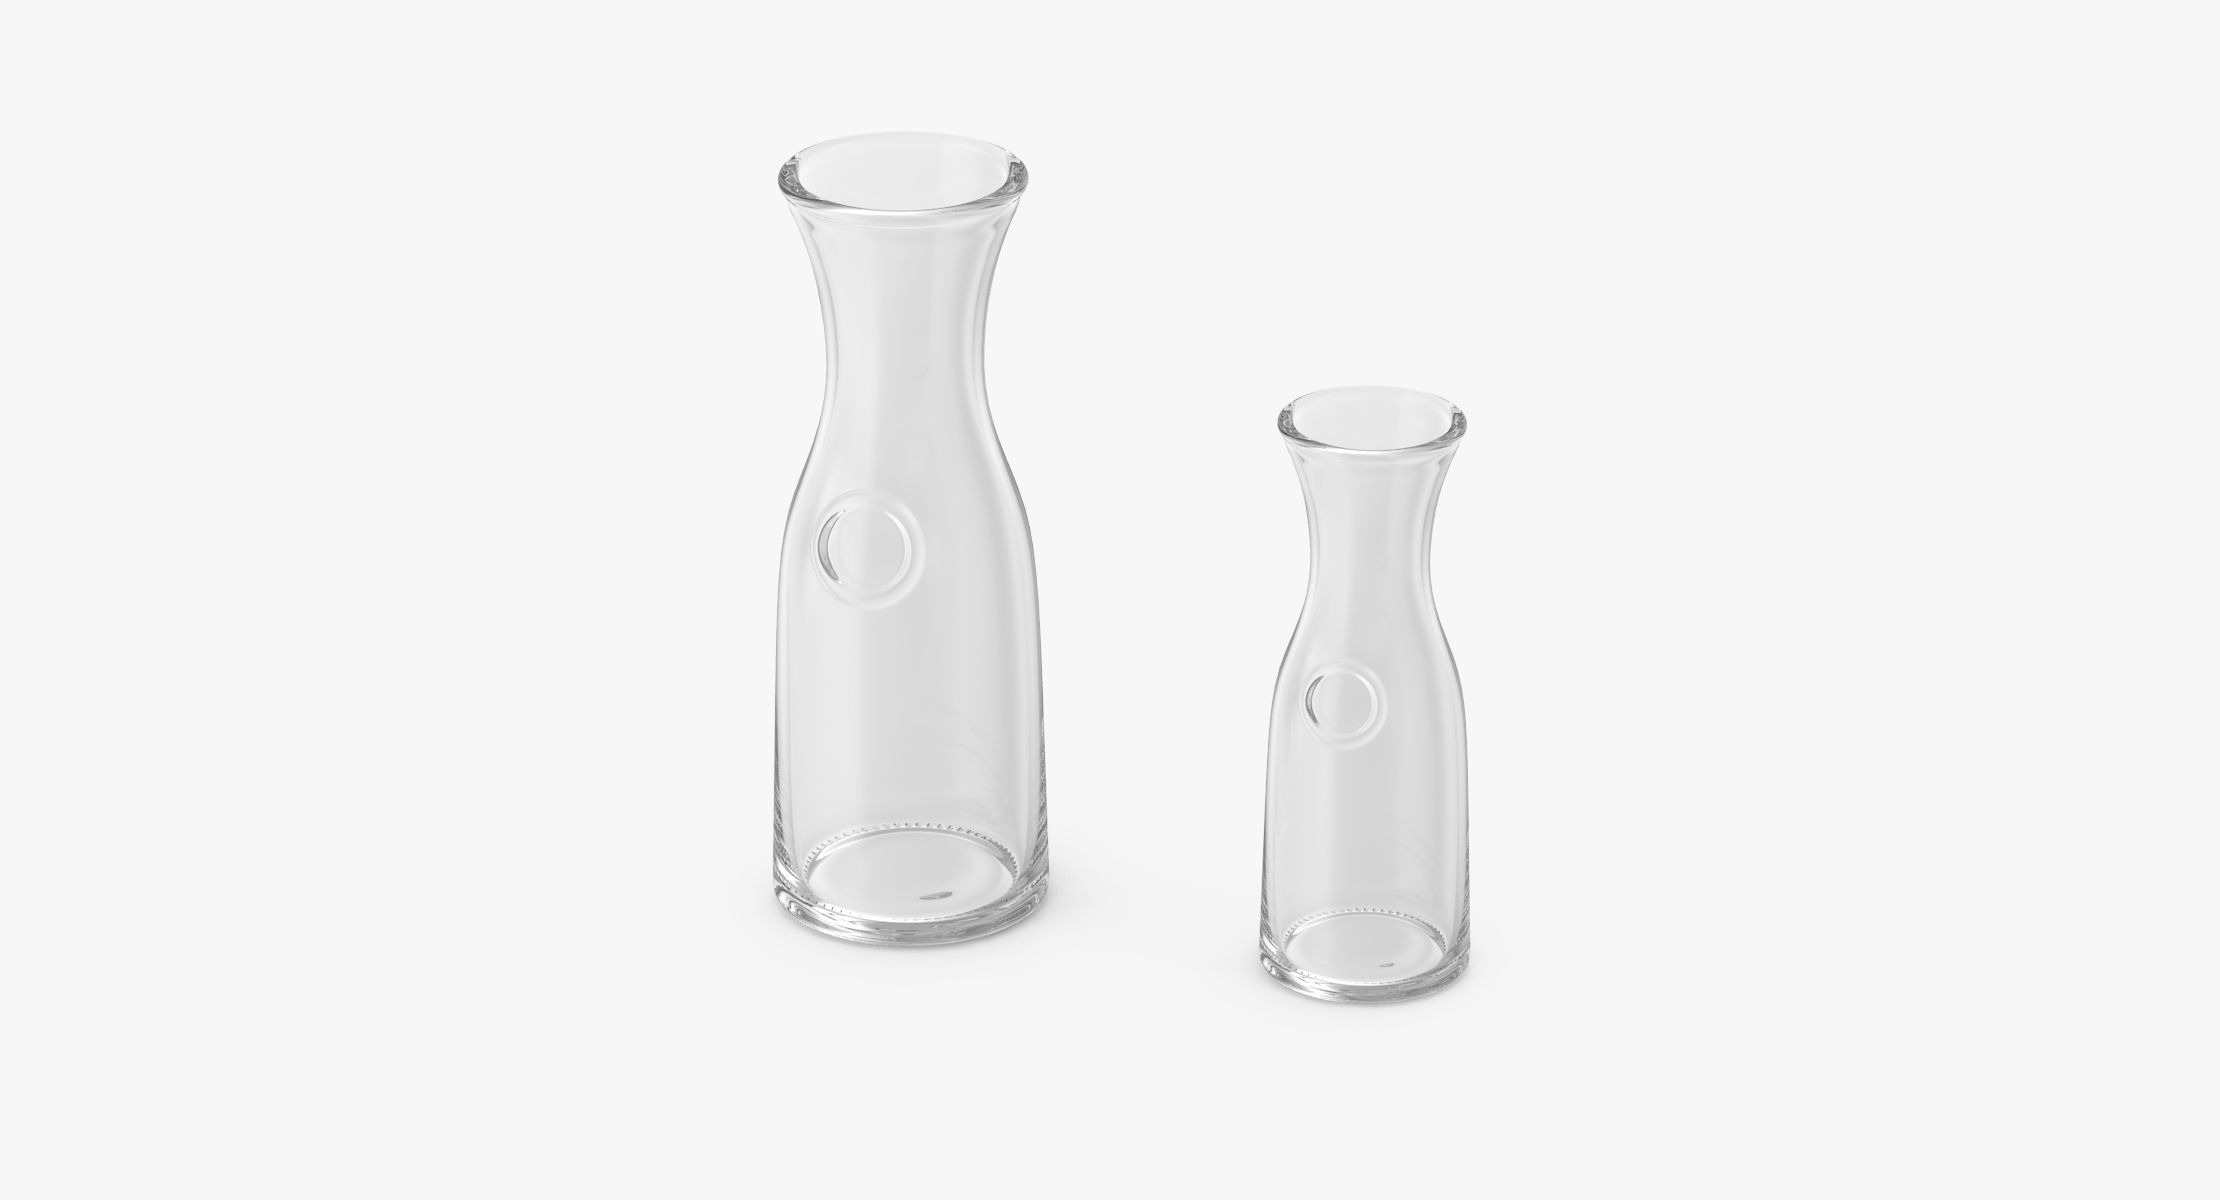 Glass Carafe - reel 1